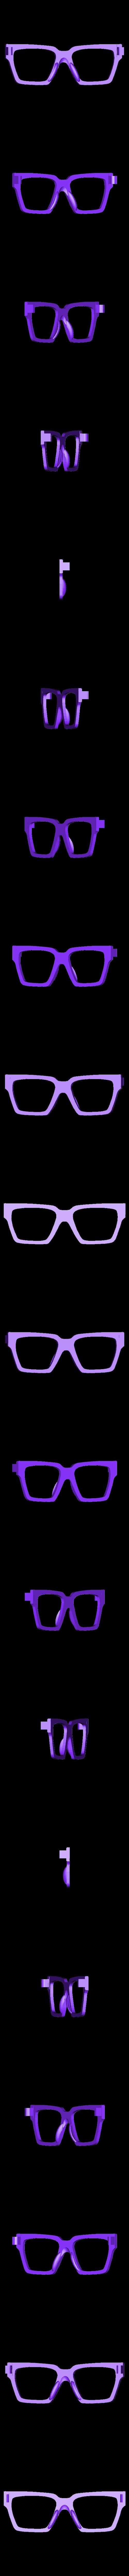 will_one_Frame.stl Download free STL file POP Glasses • 3D printable template, SimonePDA